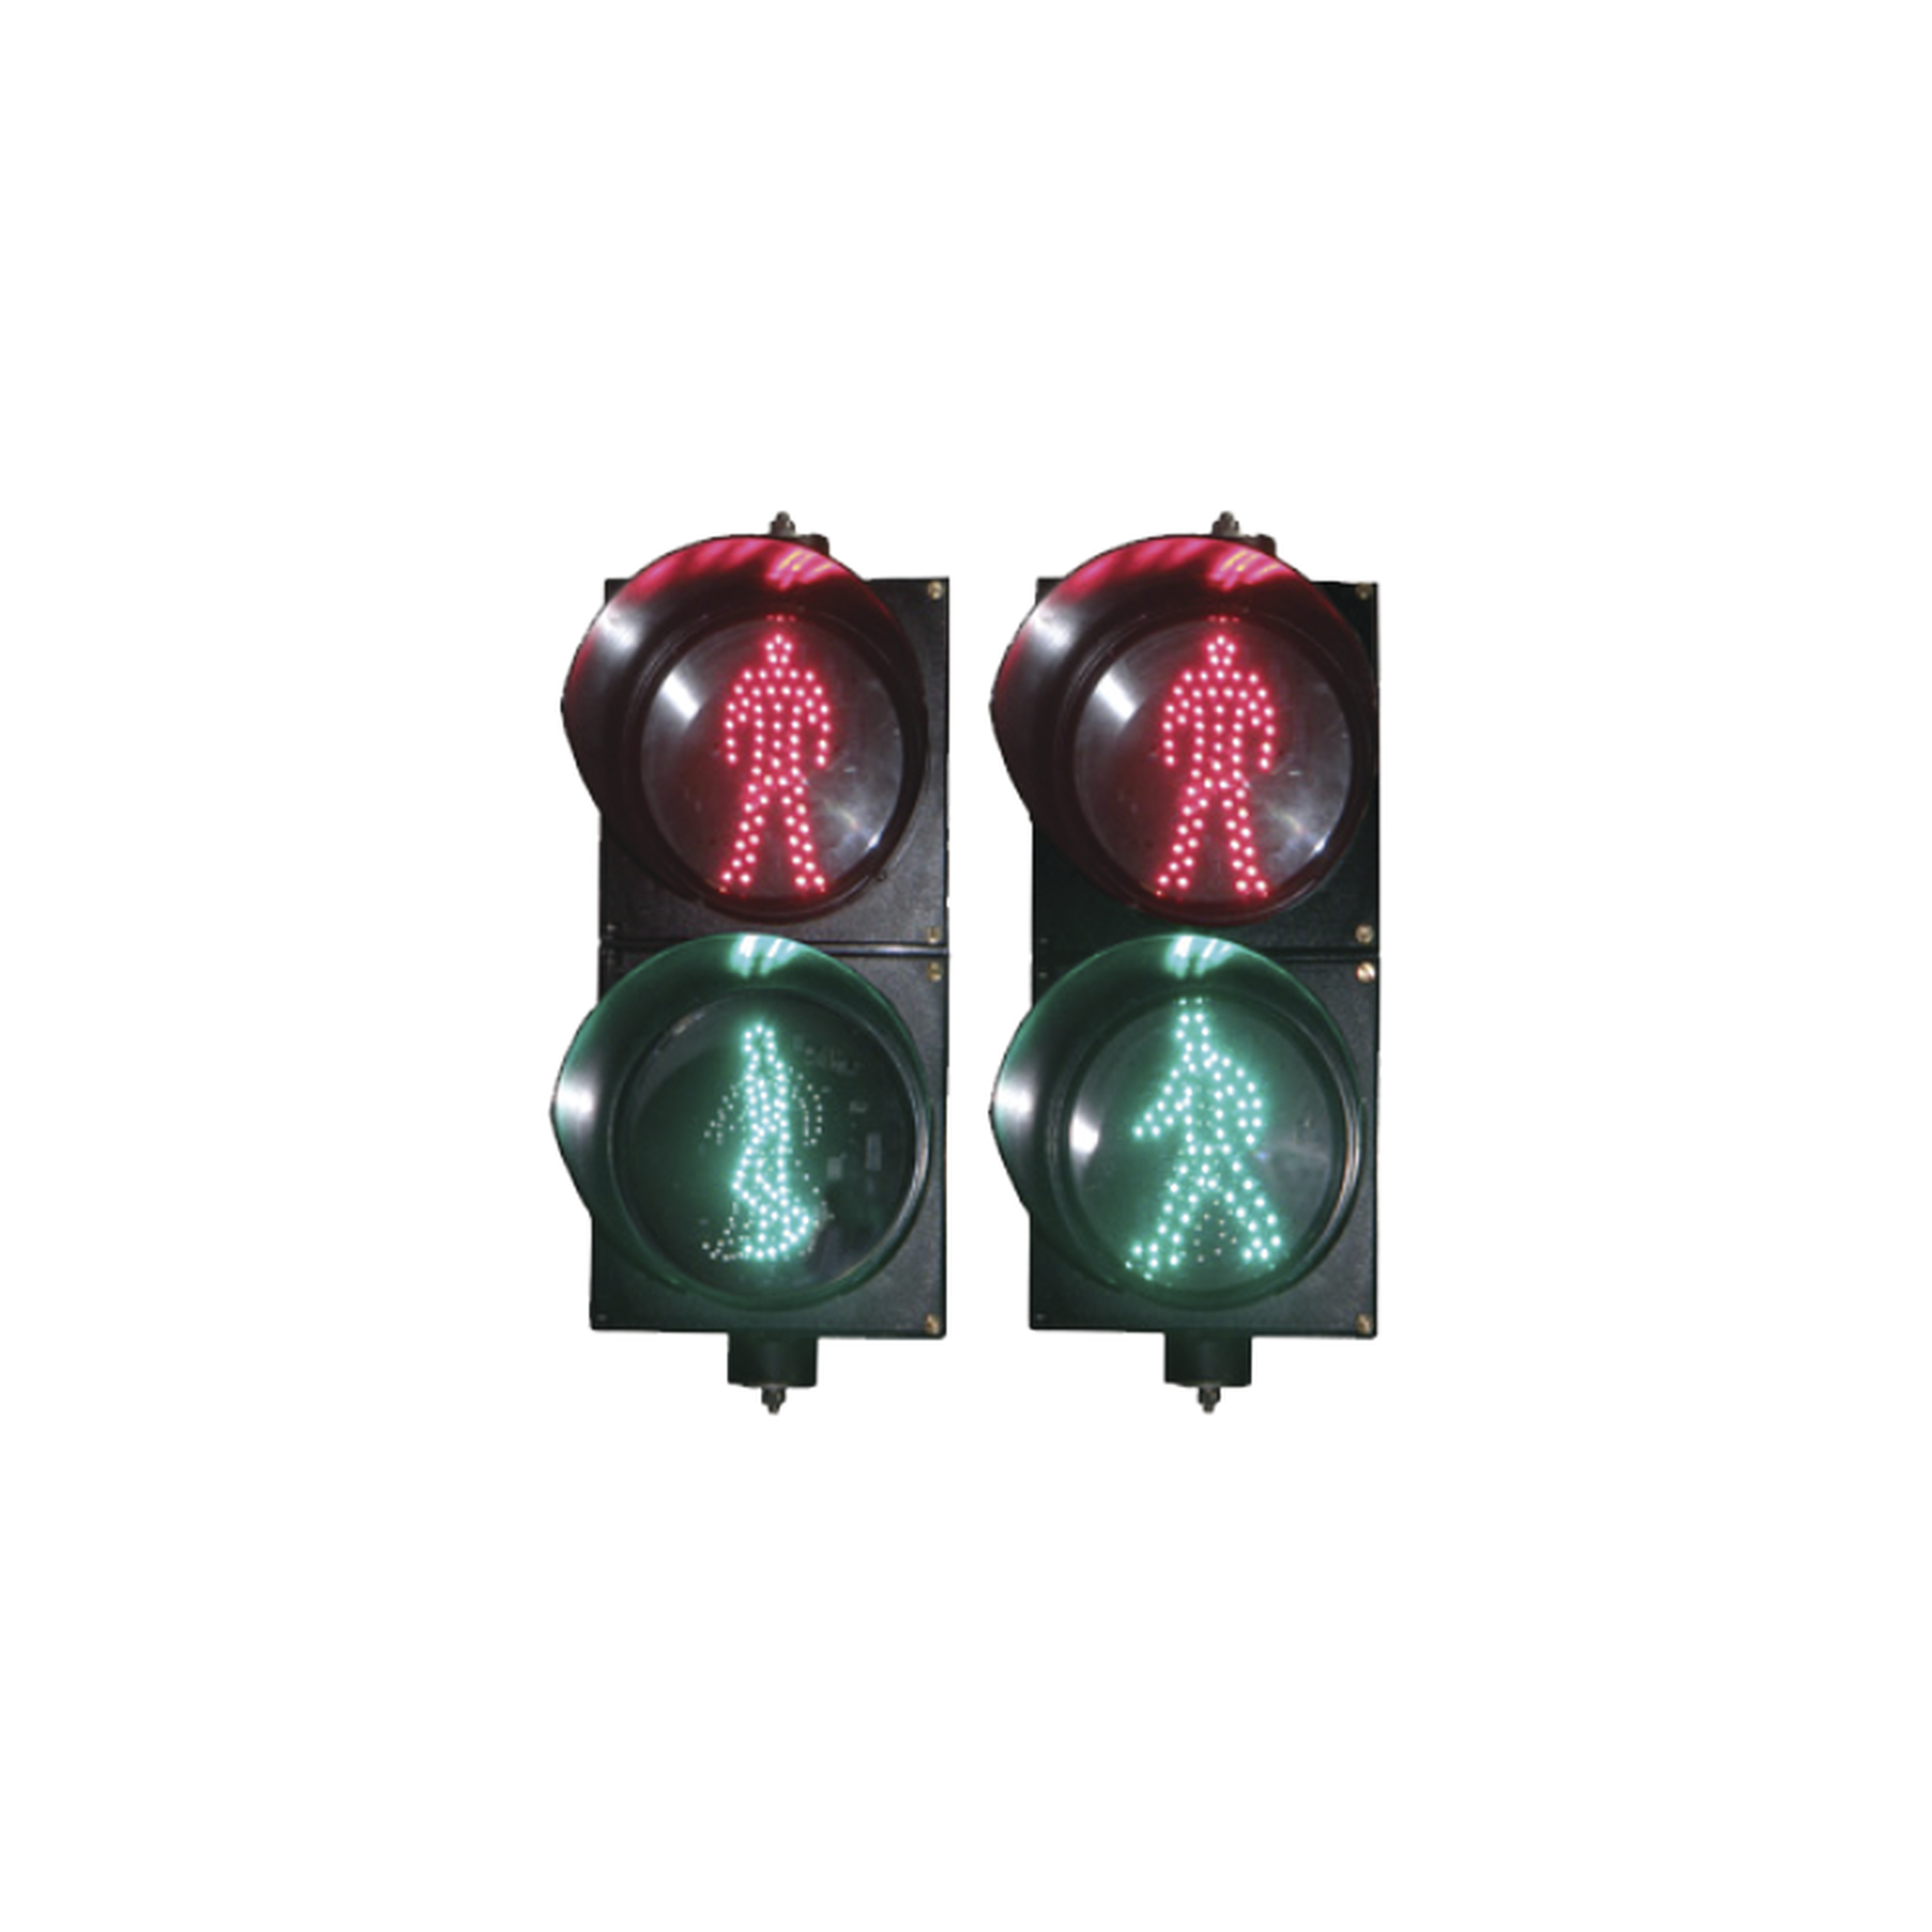 Semaforo peatonal con indicador alto/siga estatico